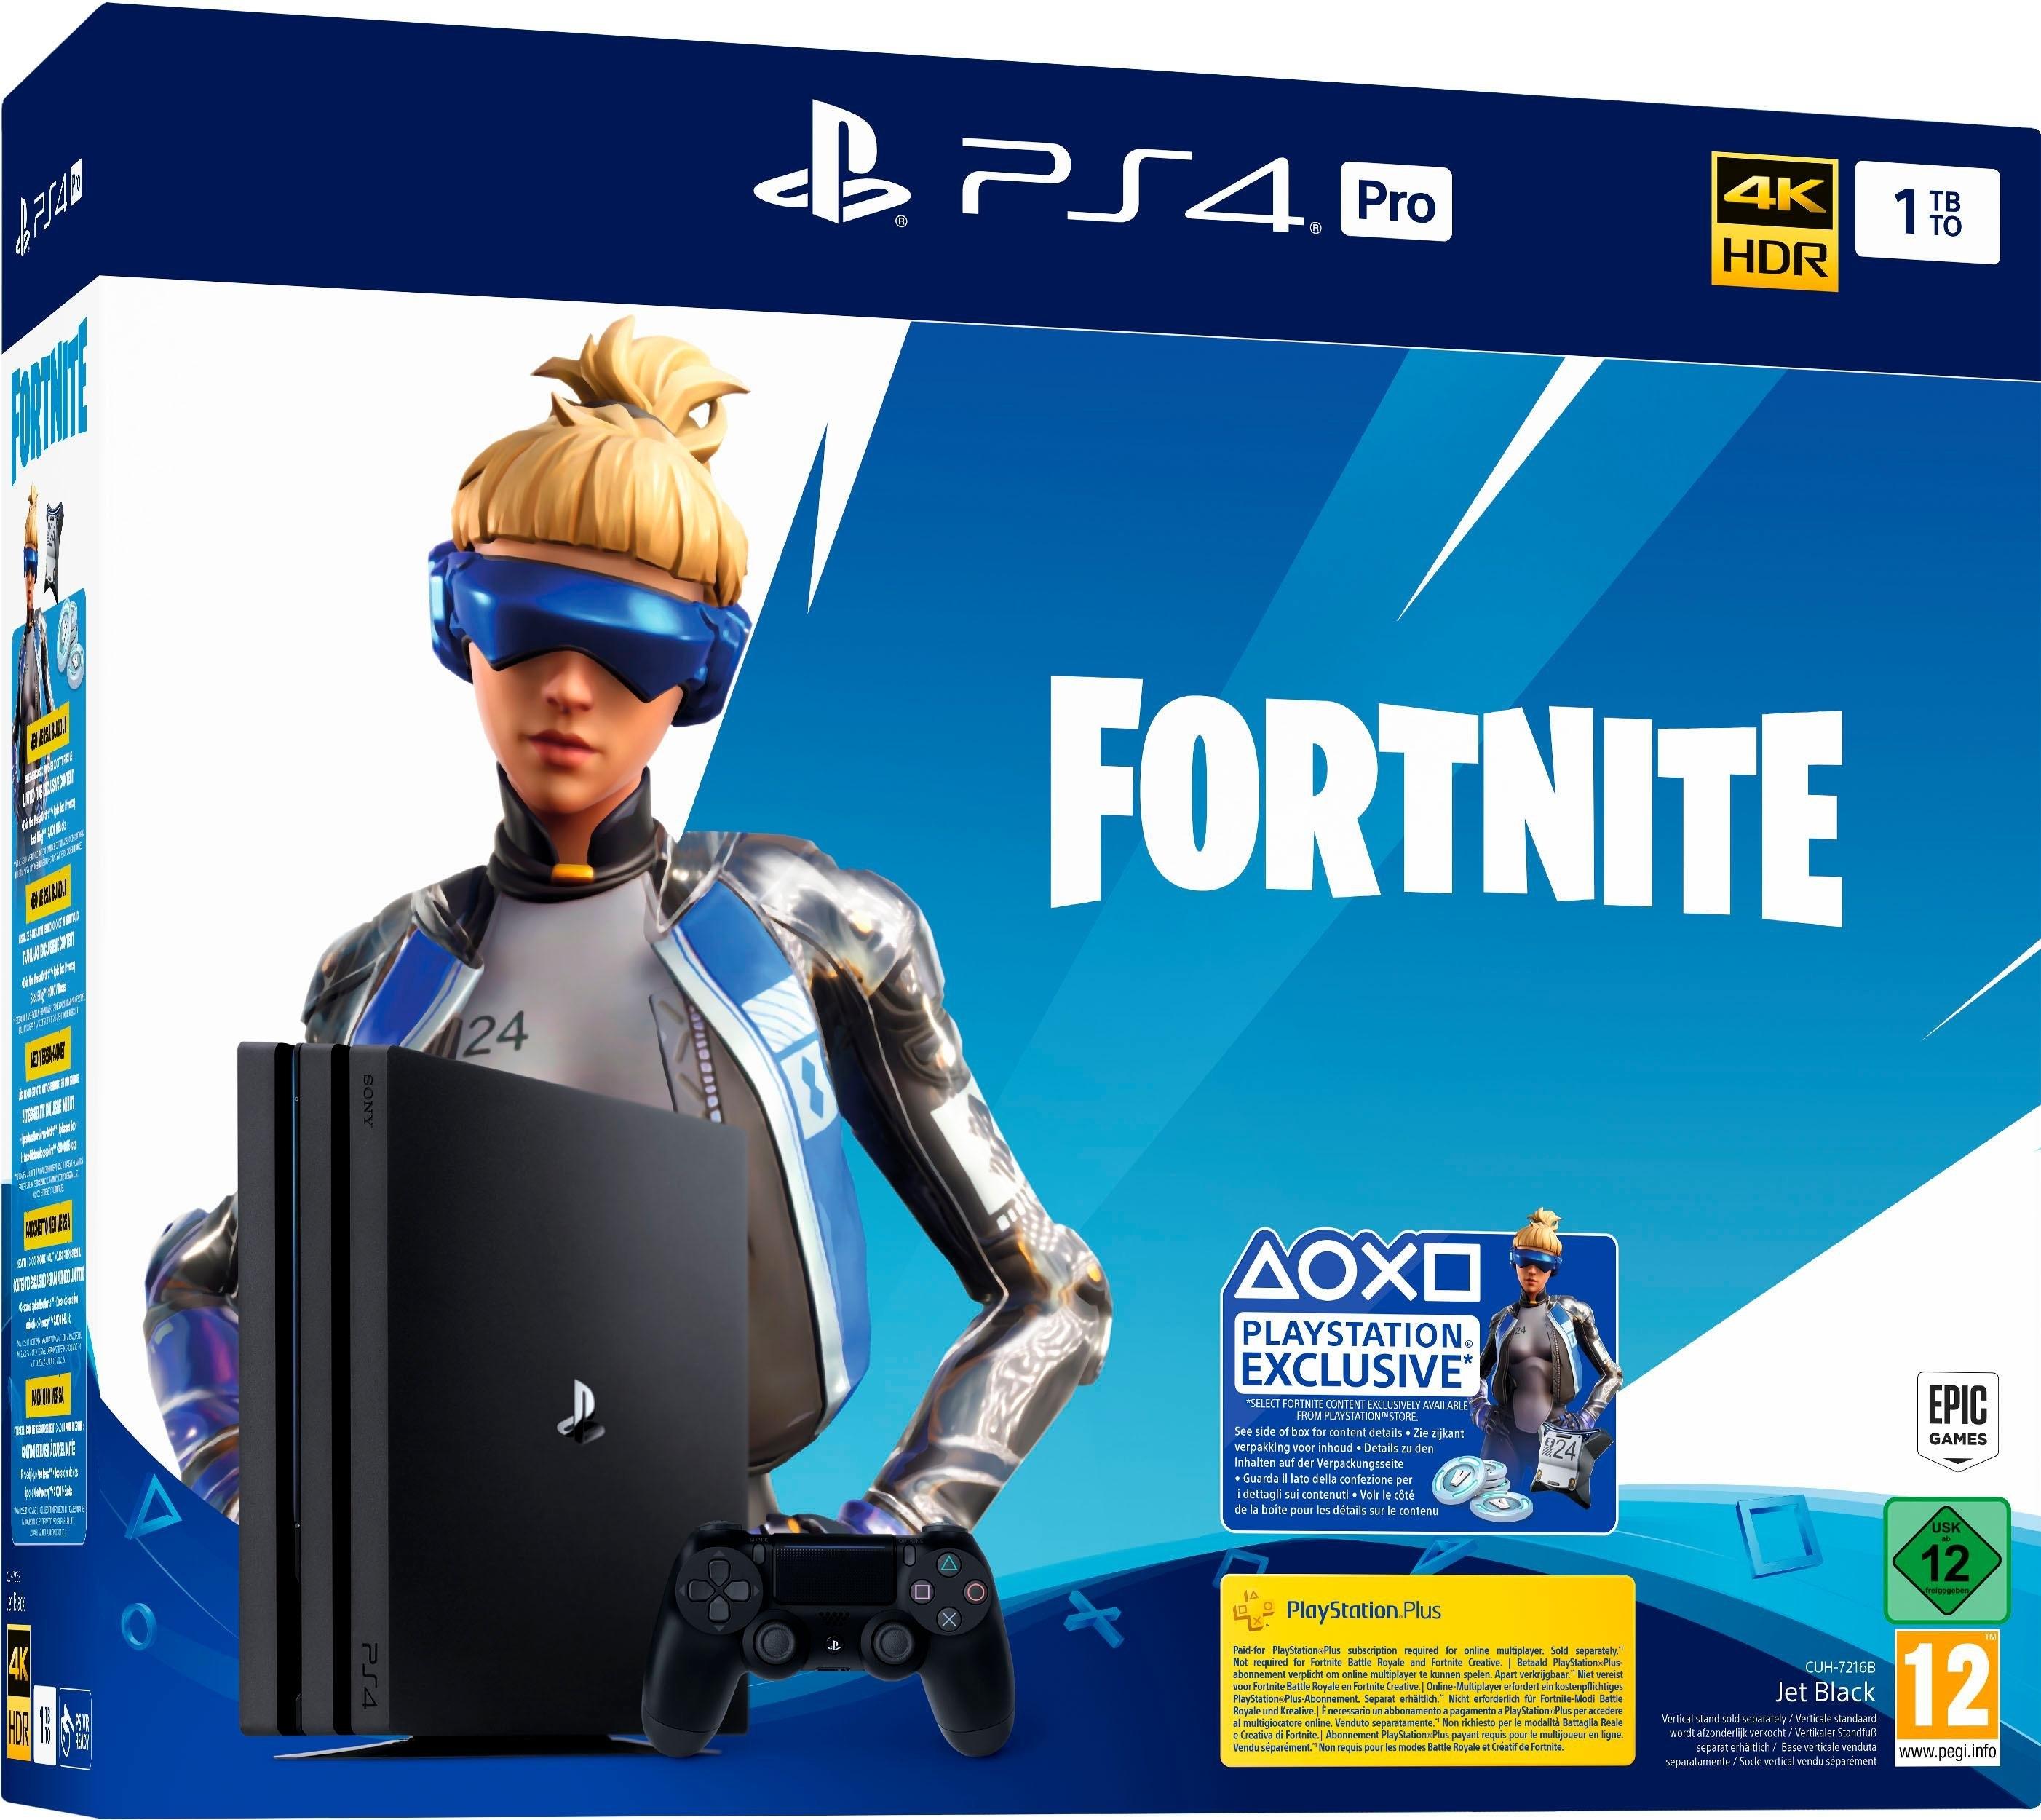 PlayStation 4 Pro - PS4 Pro 1 TB - gratis ruilen op otto.nl